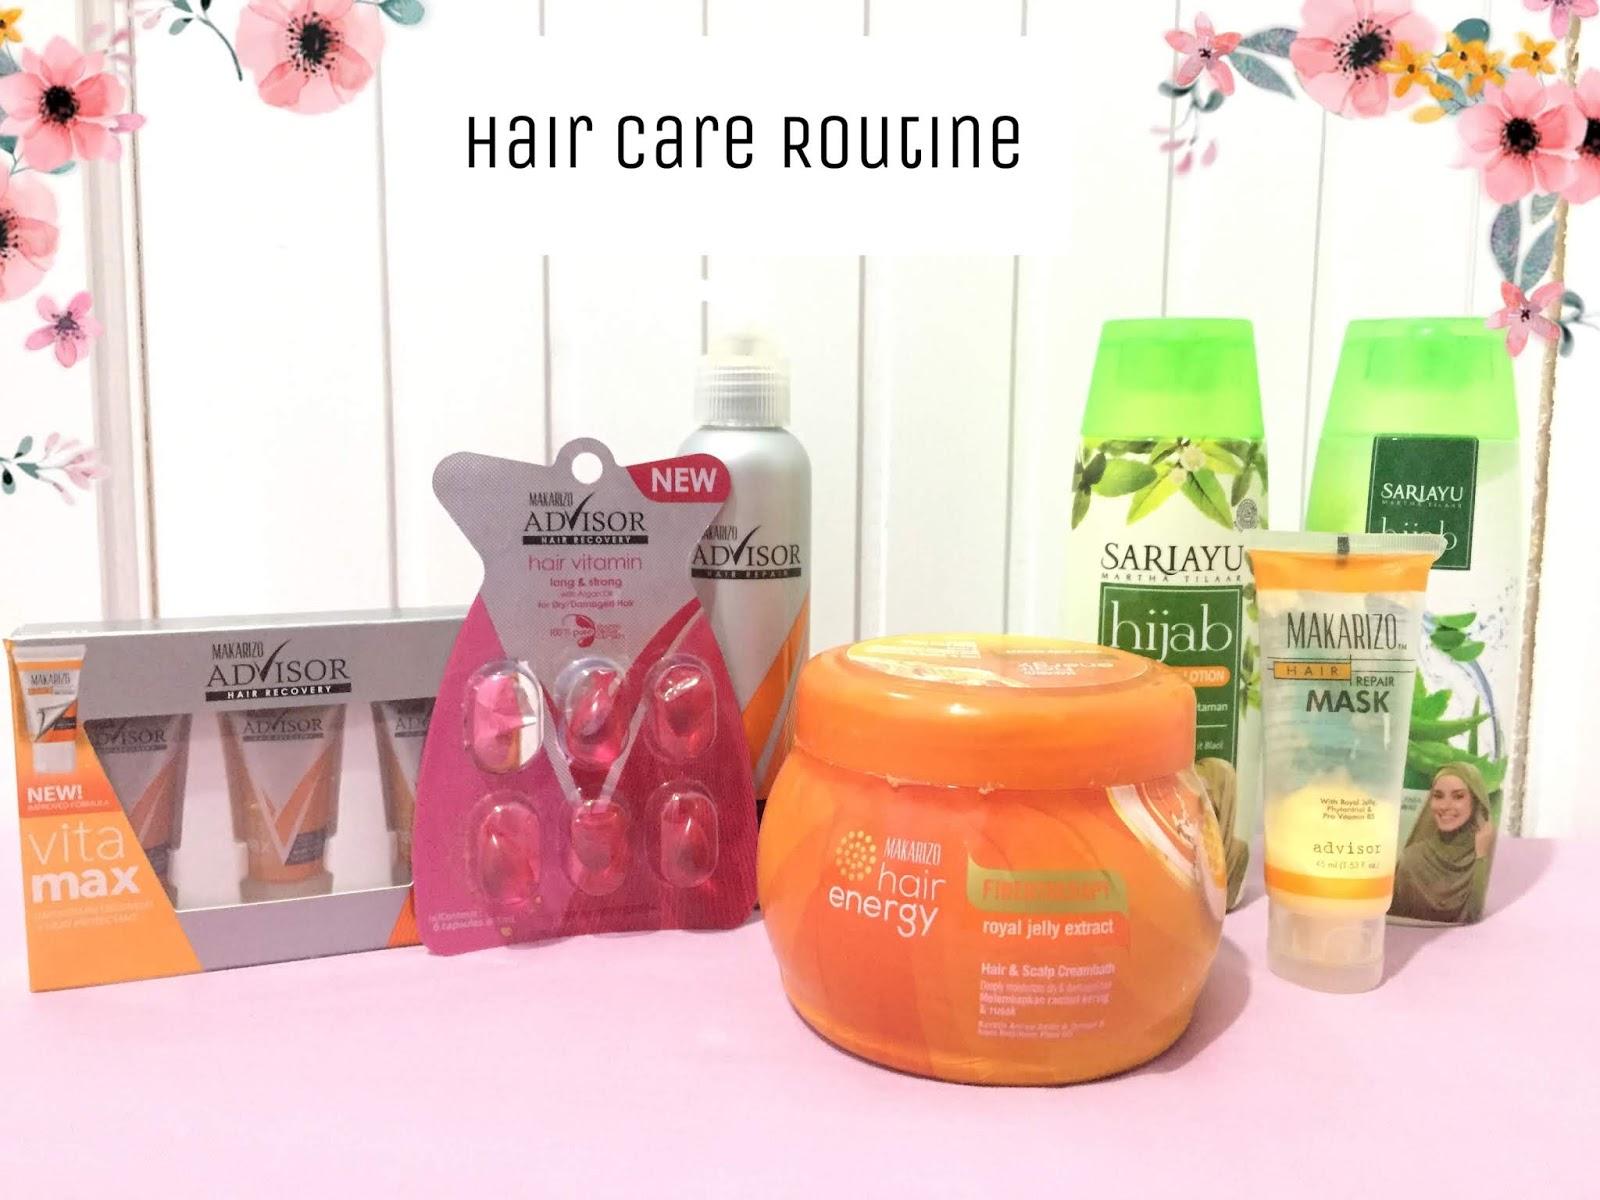 Mutiazalika S My Hair Care Routine Indonesia